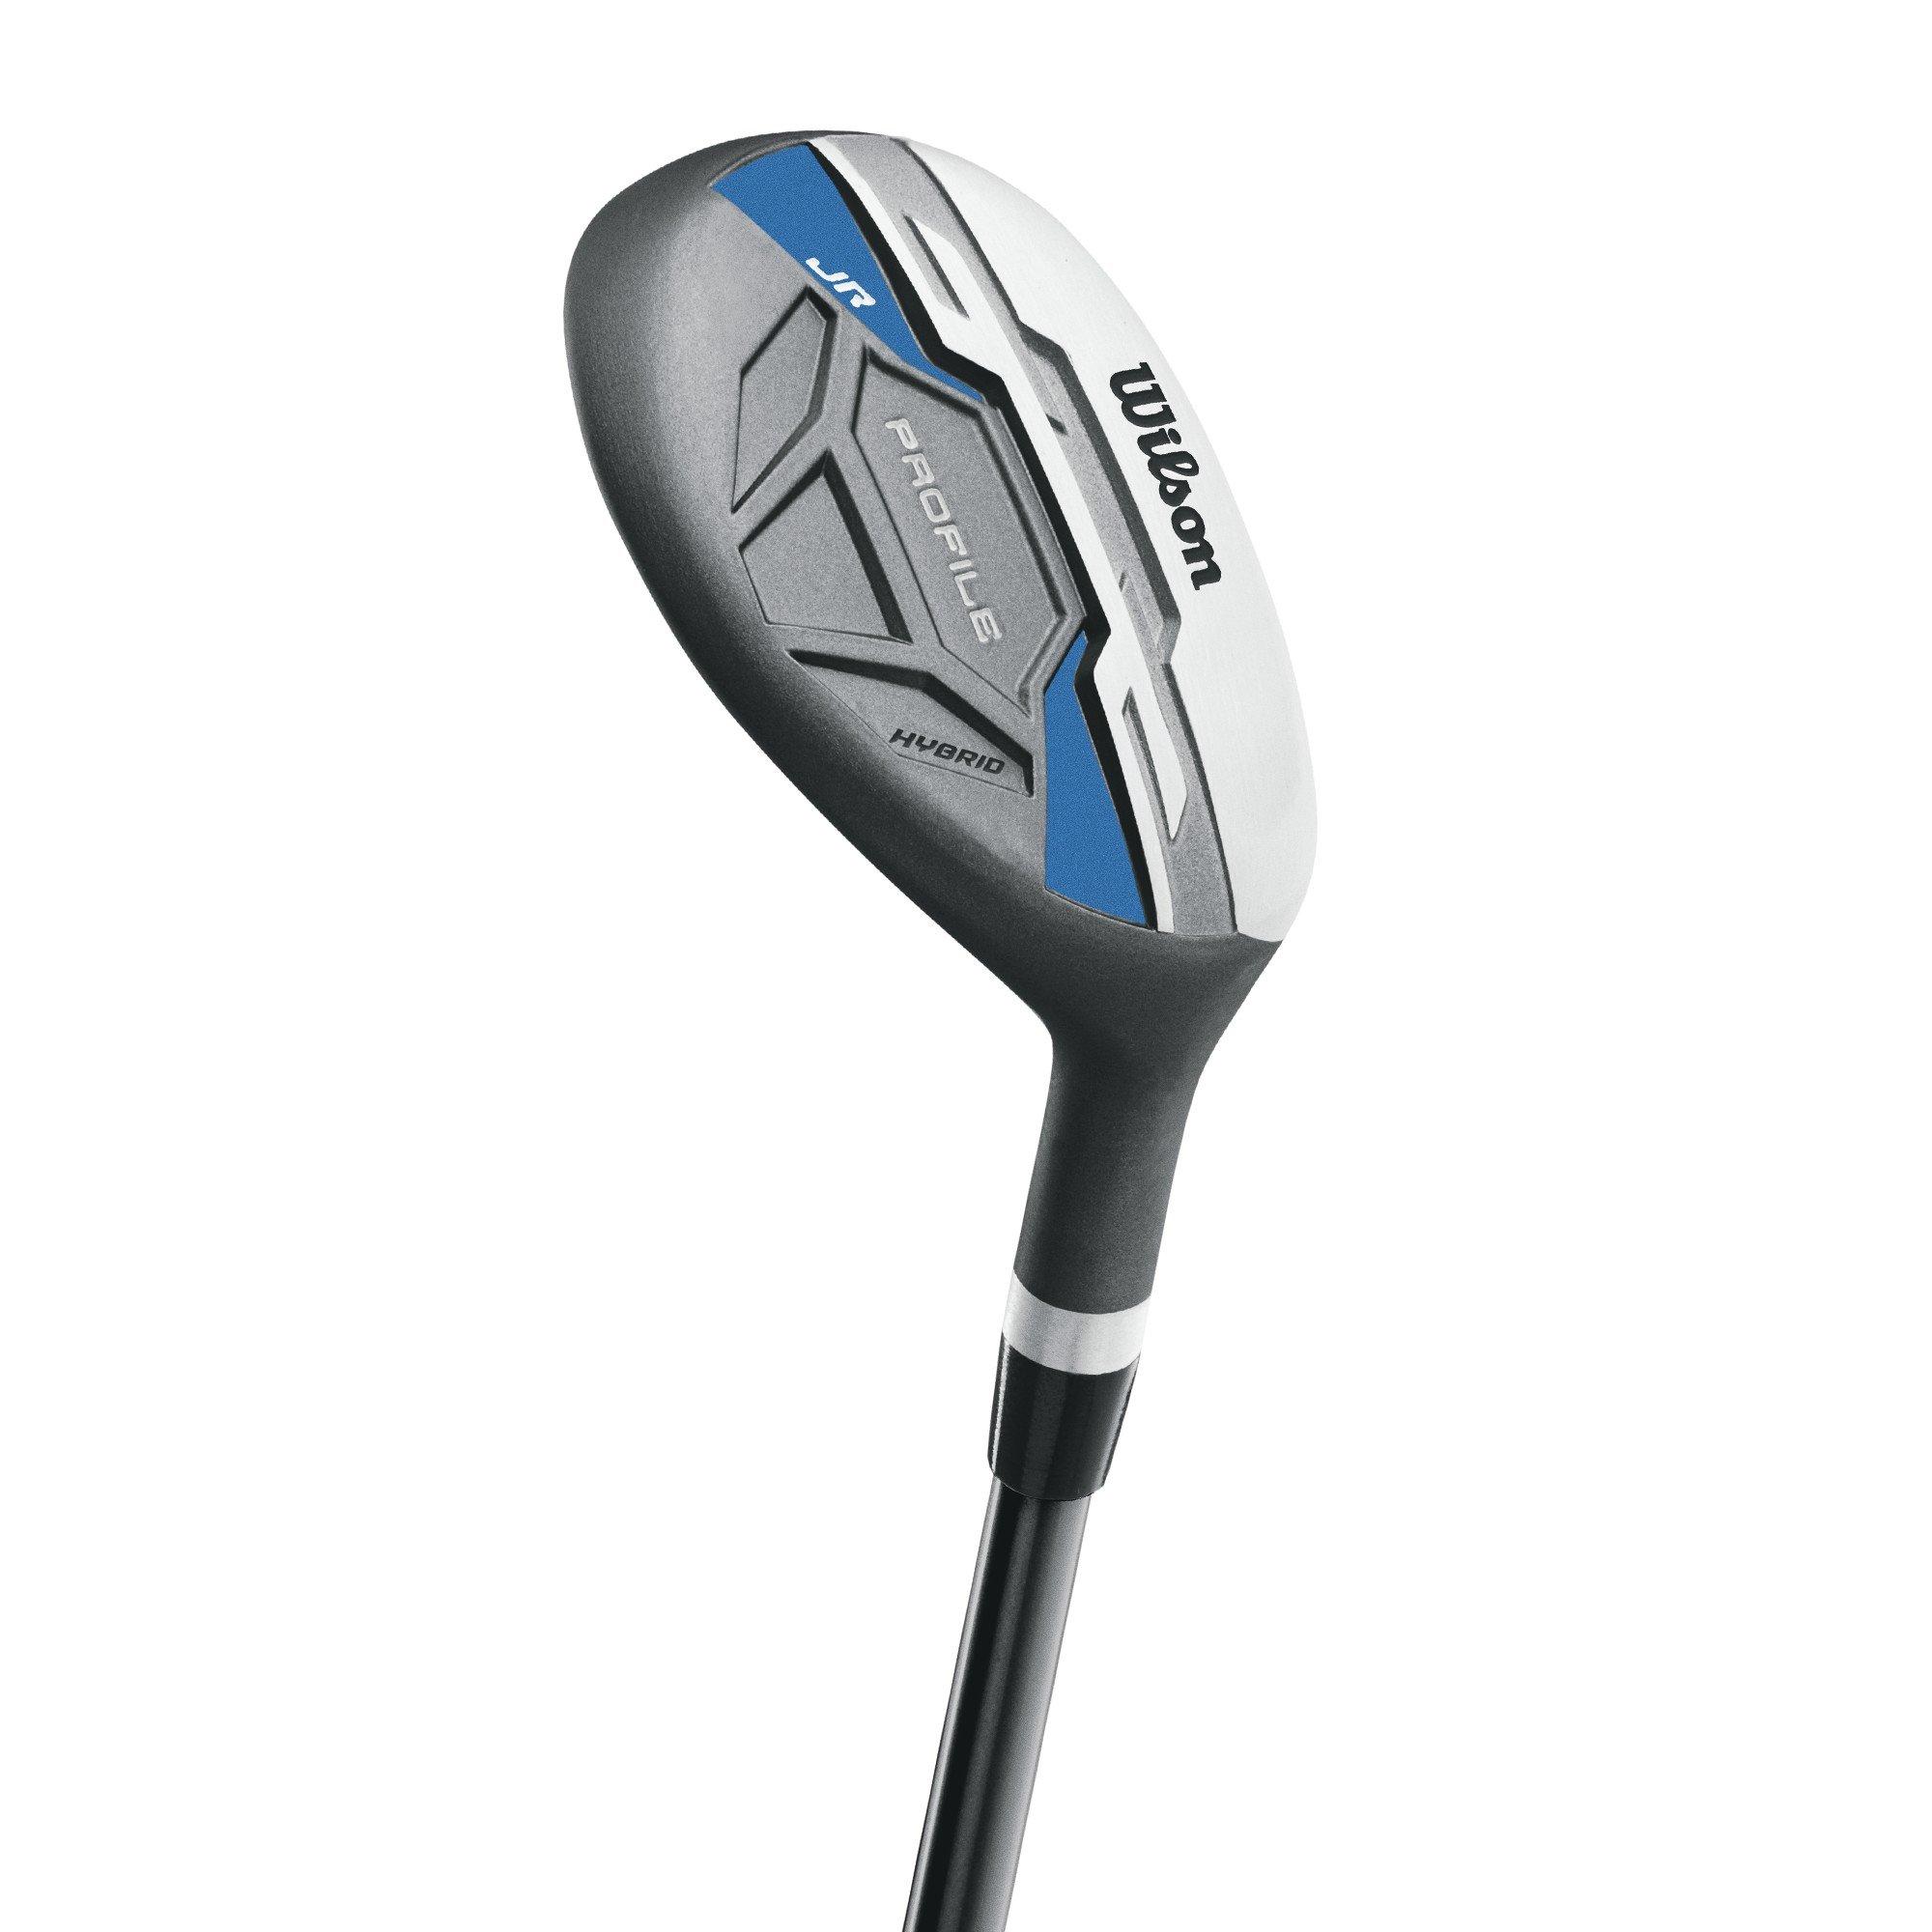 Wilson Unisex Profile Kid's Golf Set Large Left Hand, Blue (Ages 11-14) by Wilson (Image #3)